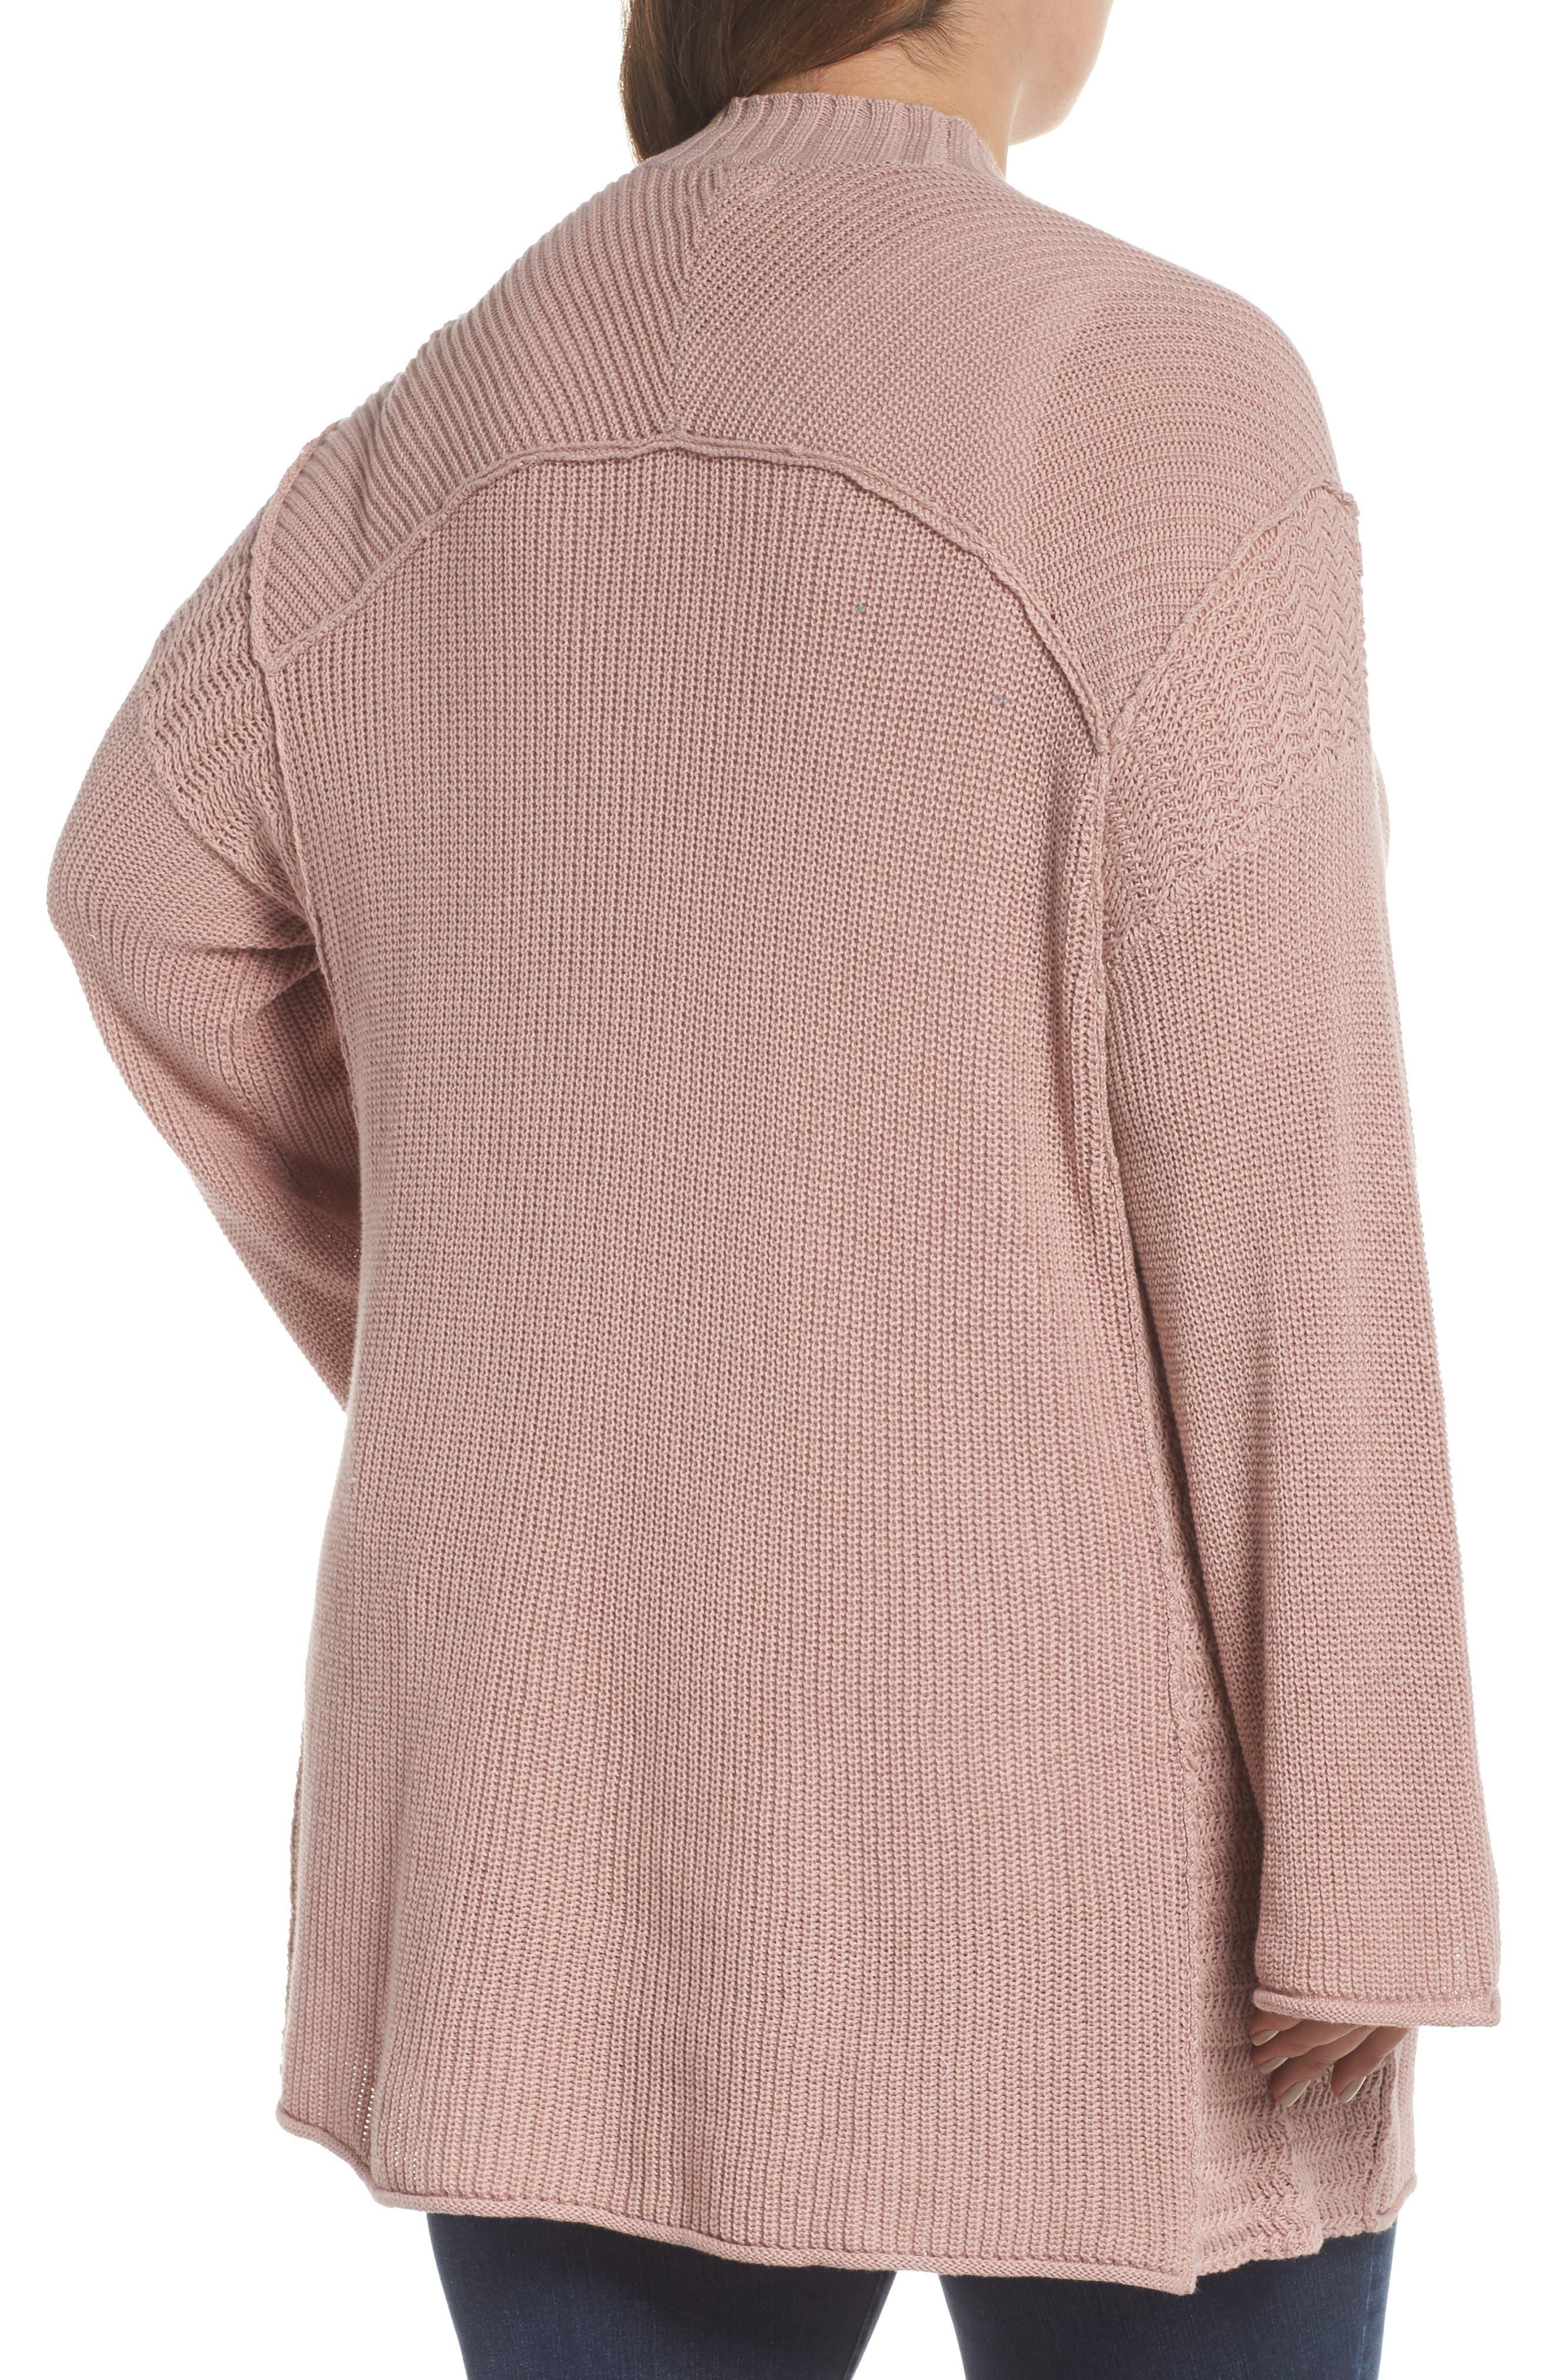 Sweater Knit Cardigan,                             Alternate thumbnail 2, color,                             Pink Adobe